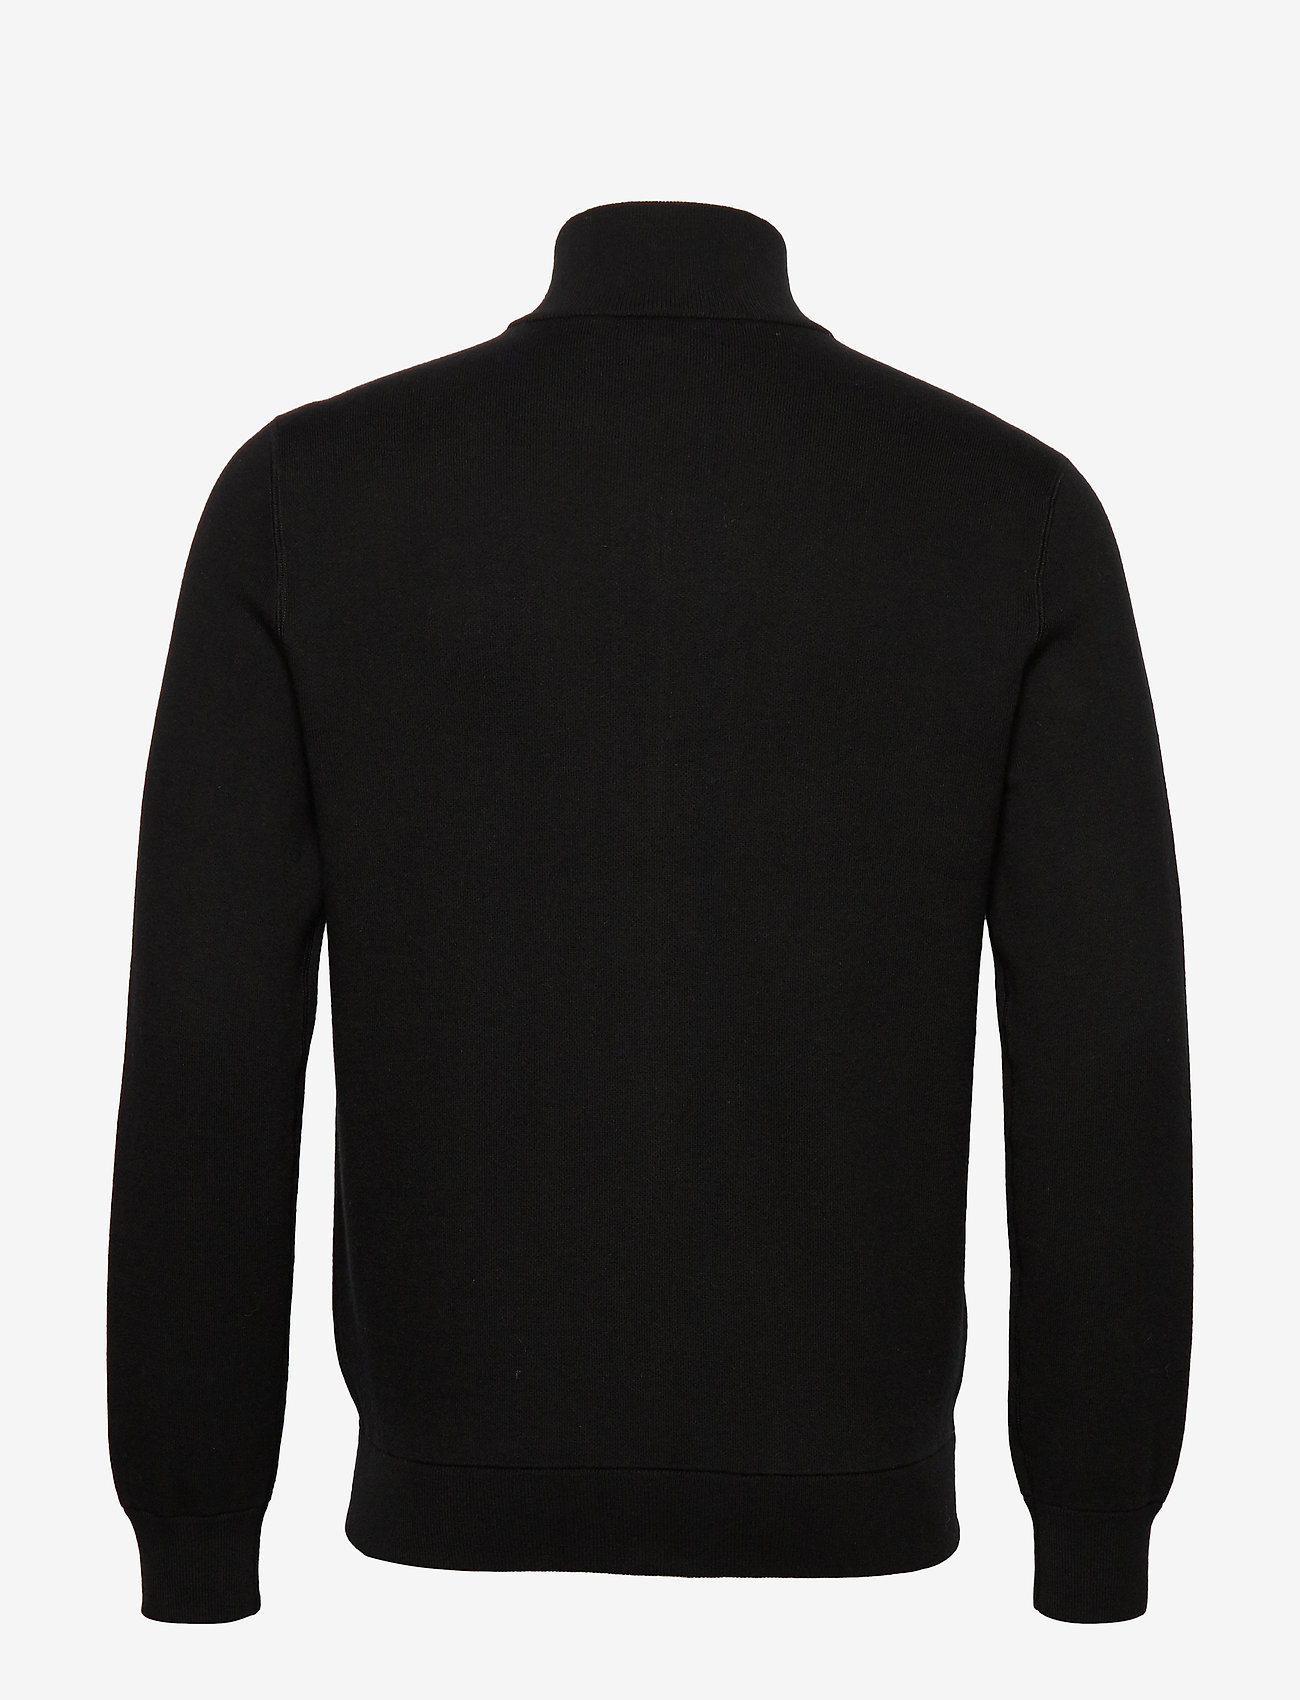 Banana Republic - Sweater Jacket - basic knitwear - black - 1